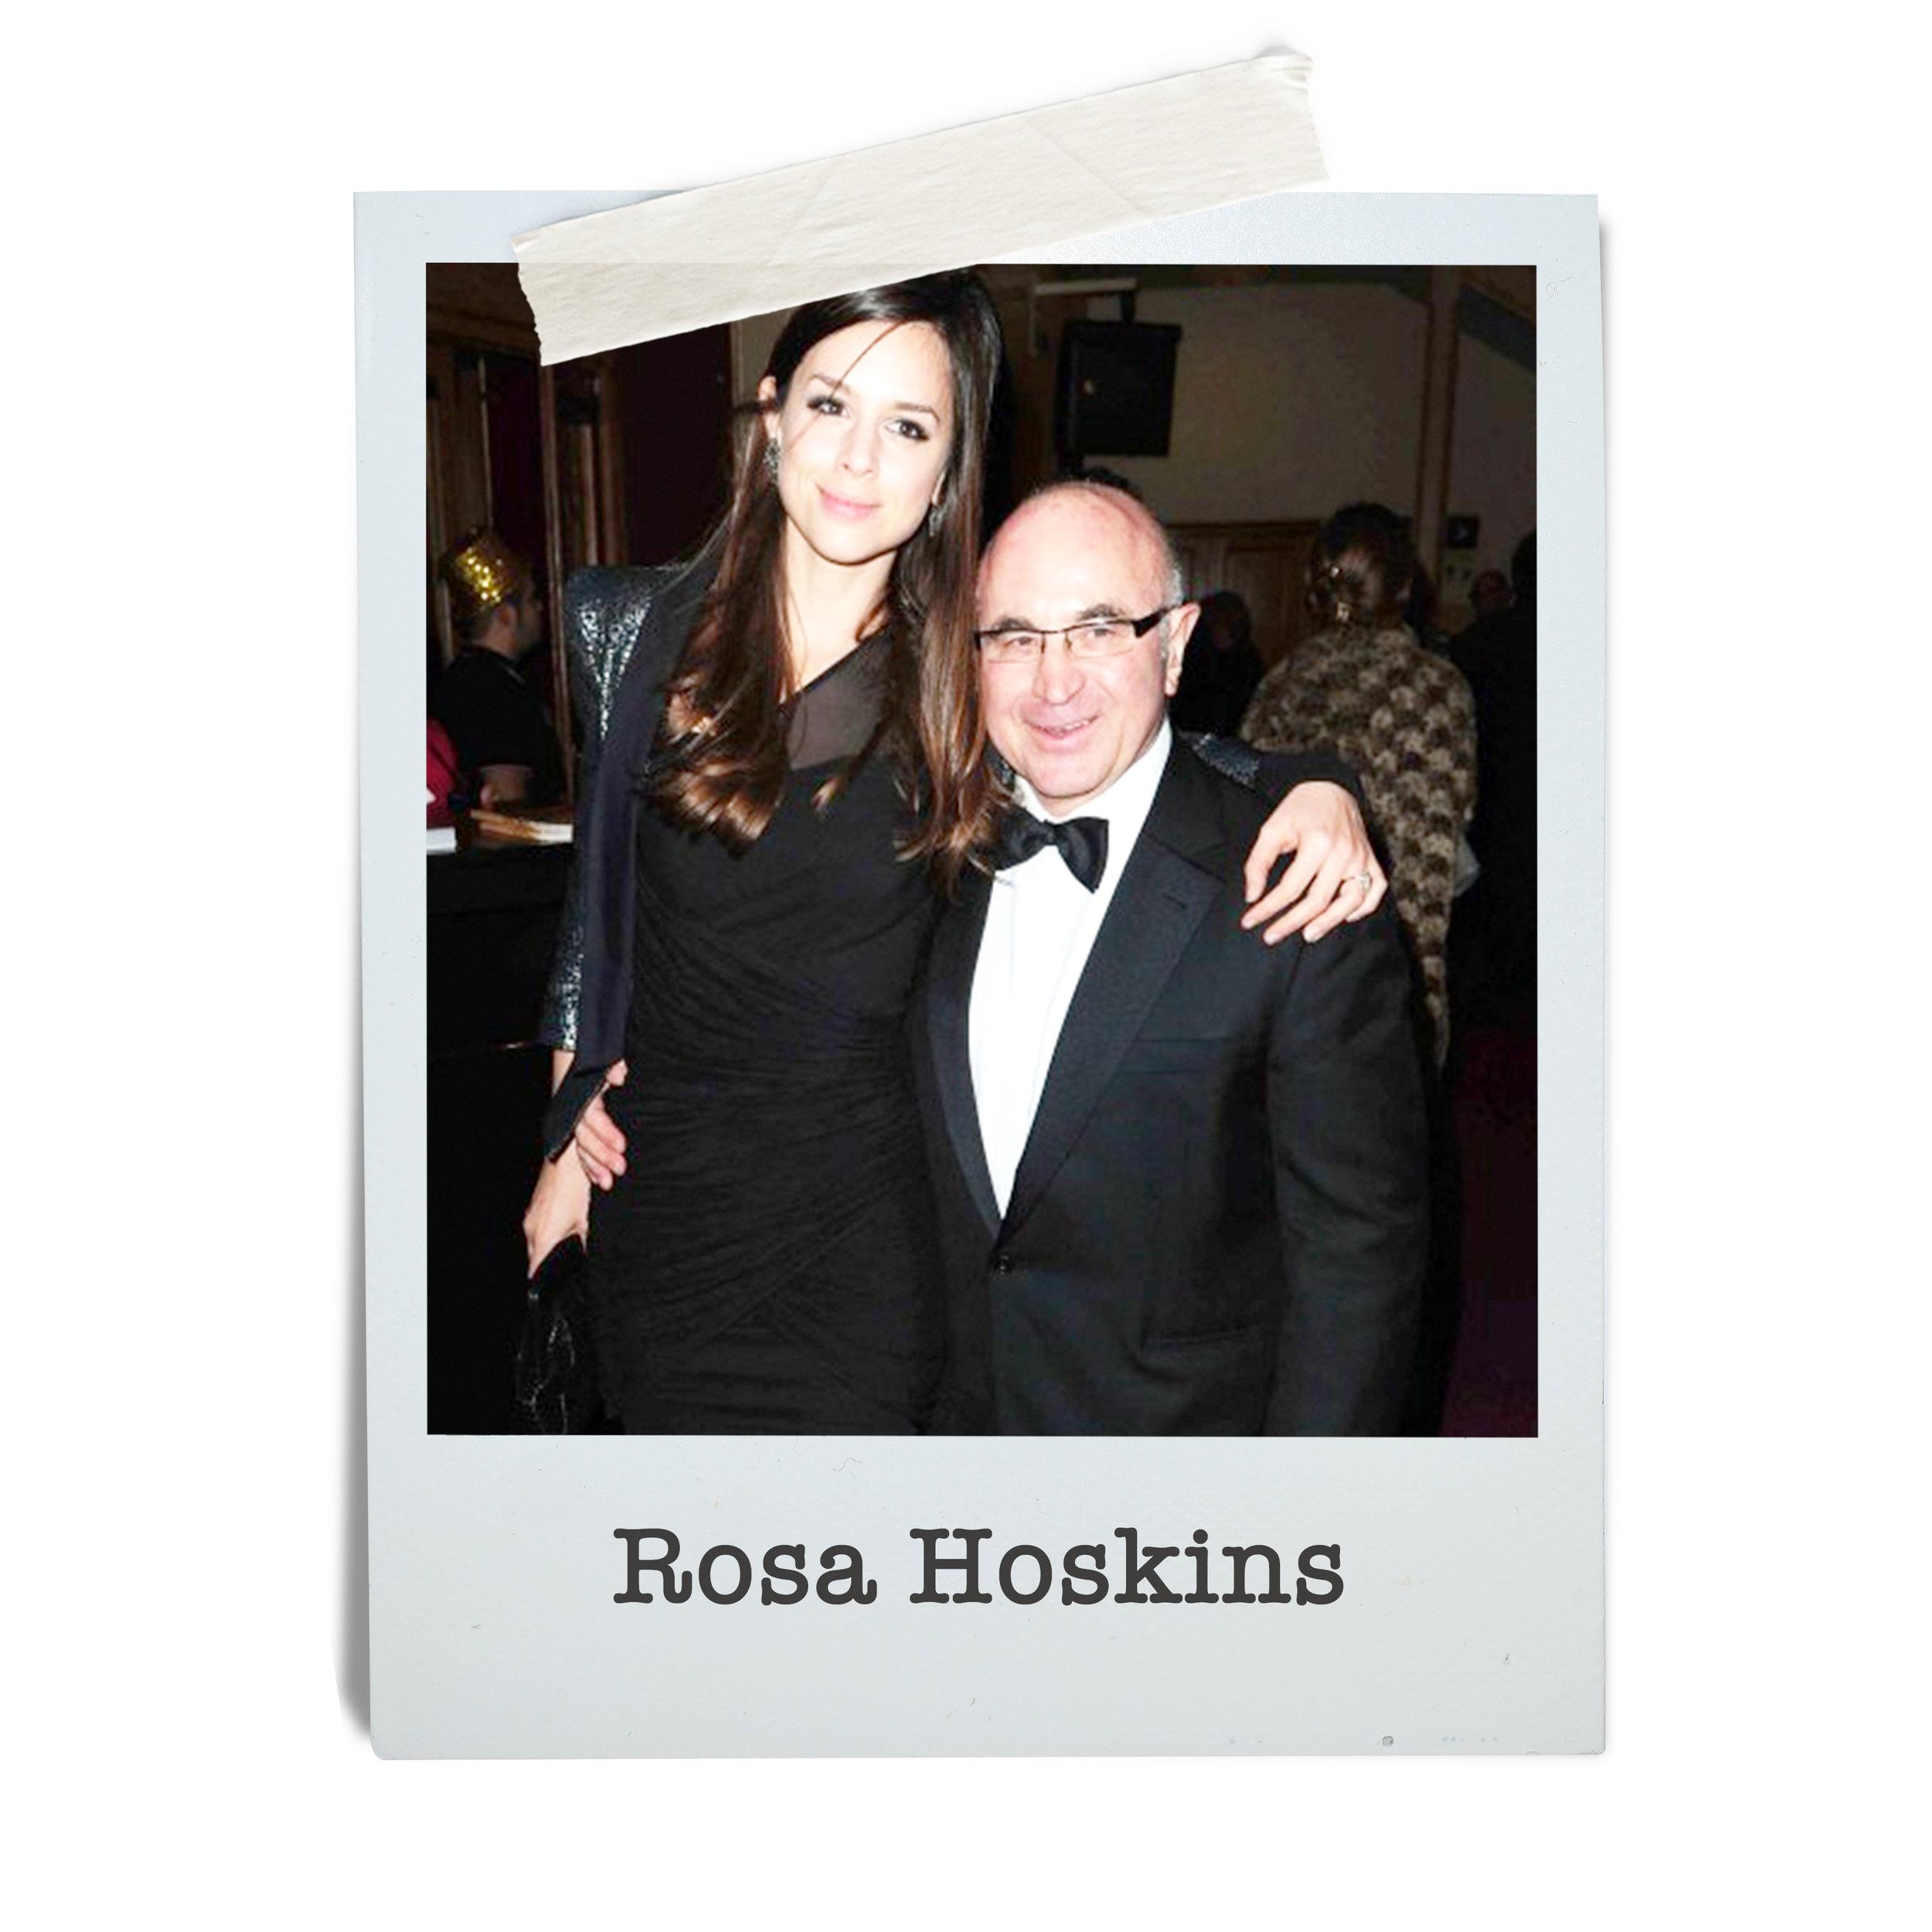 Rosa Hoskins